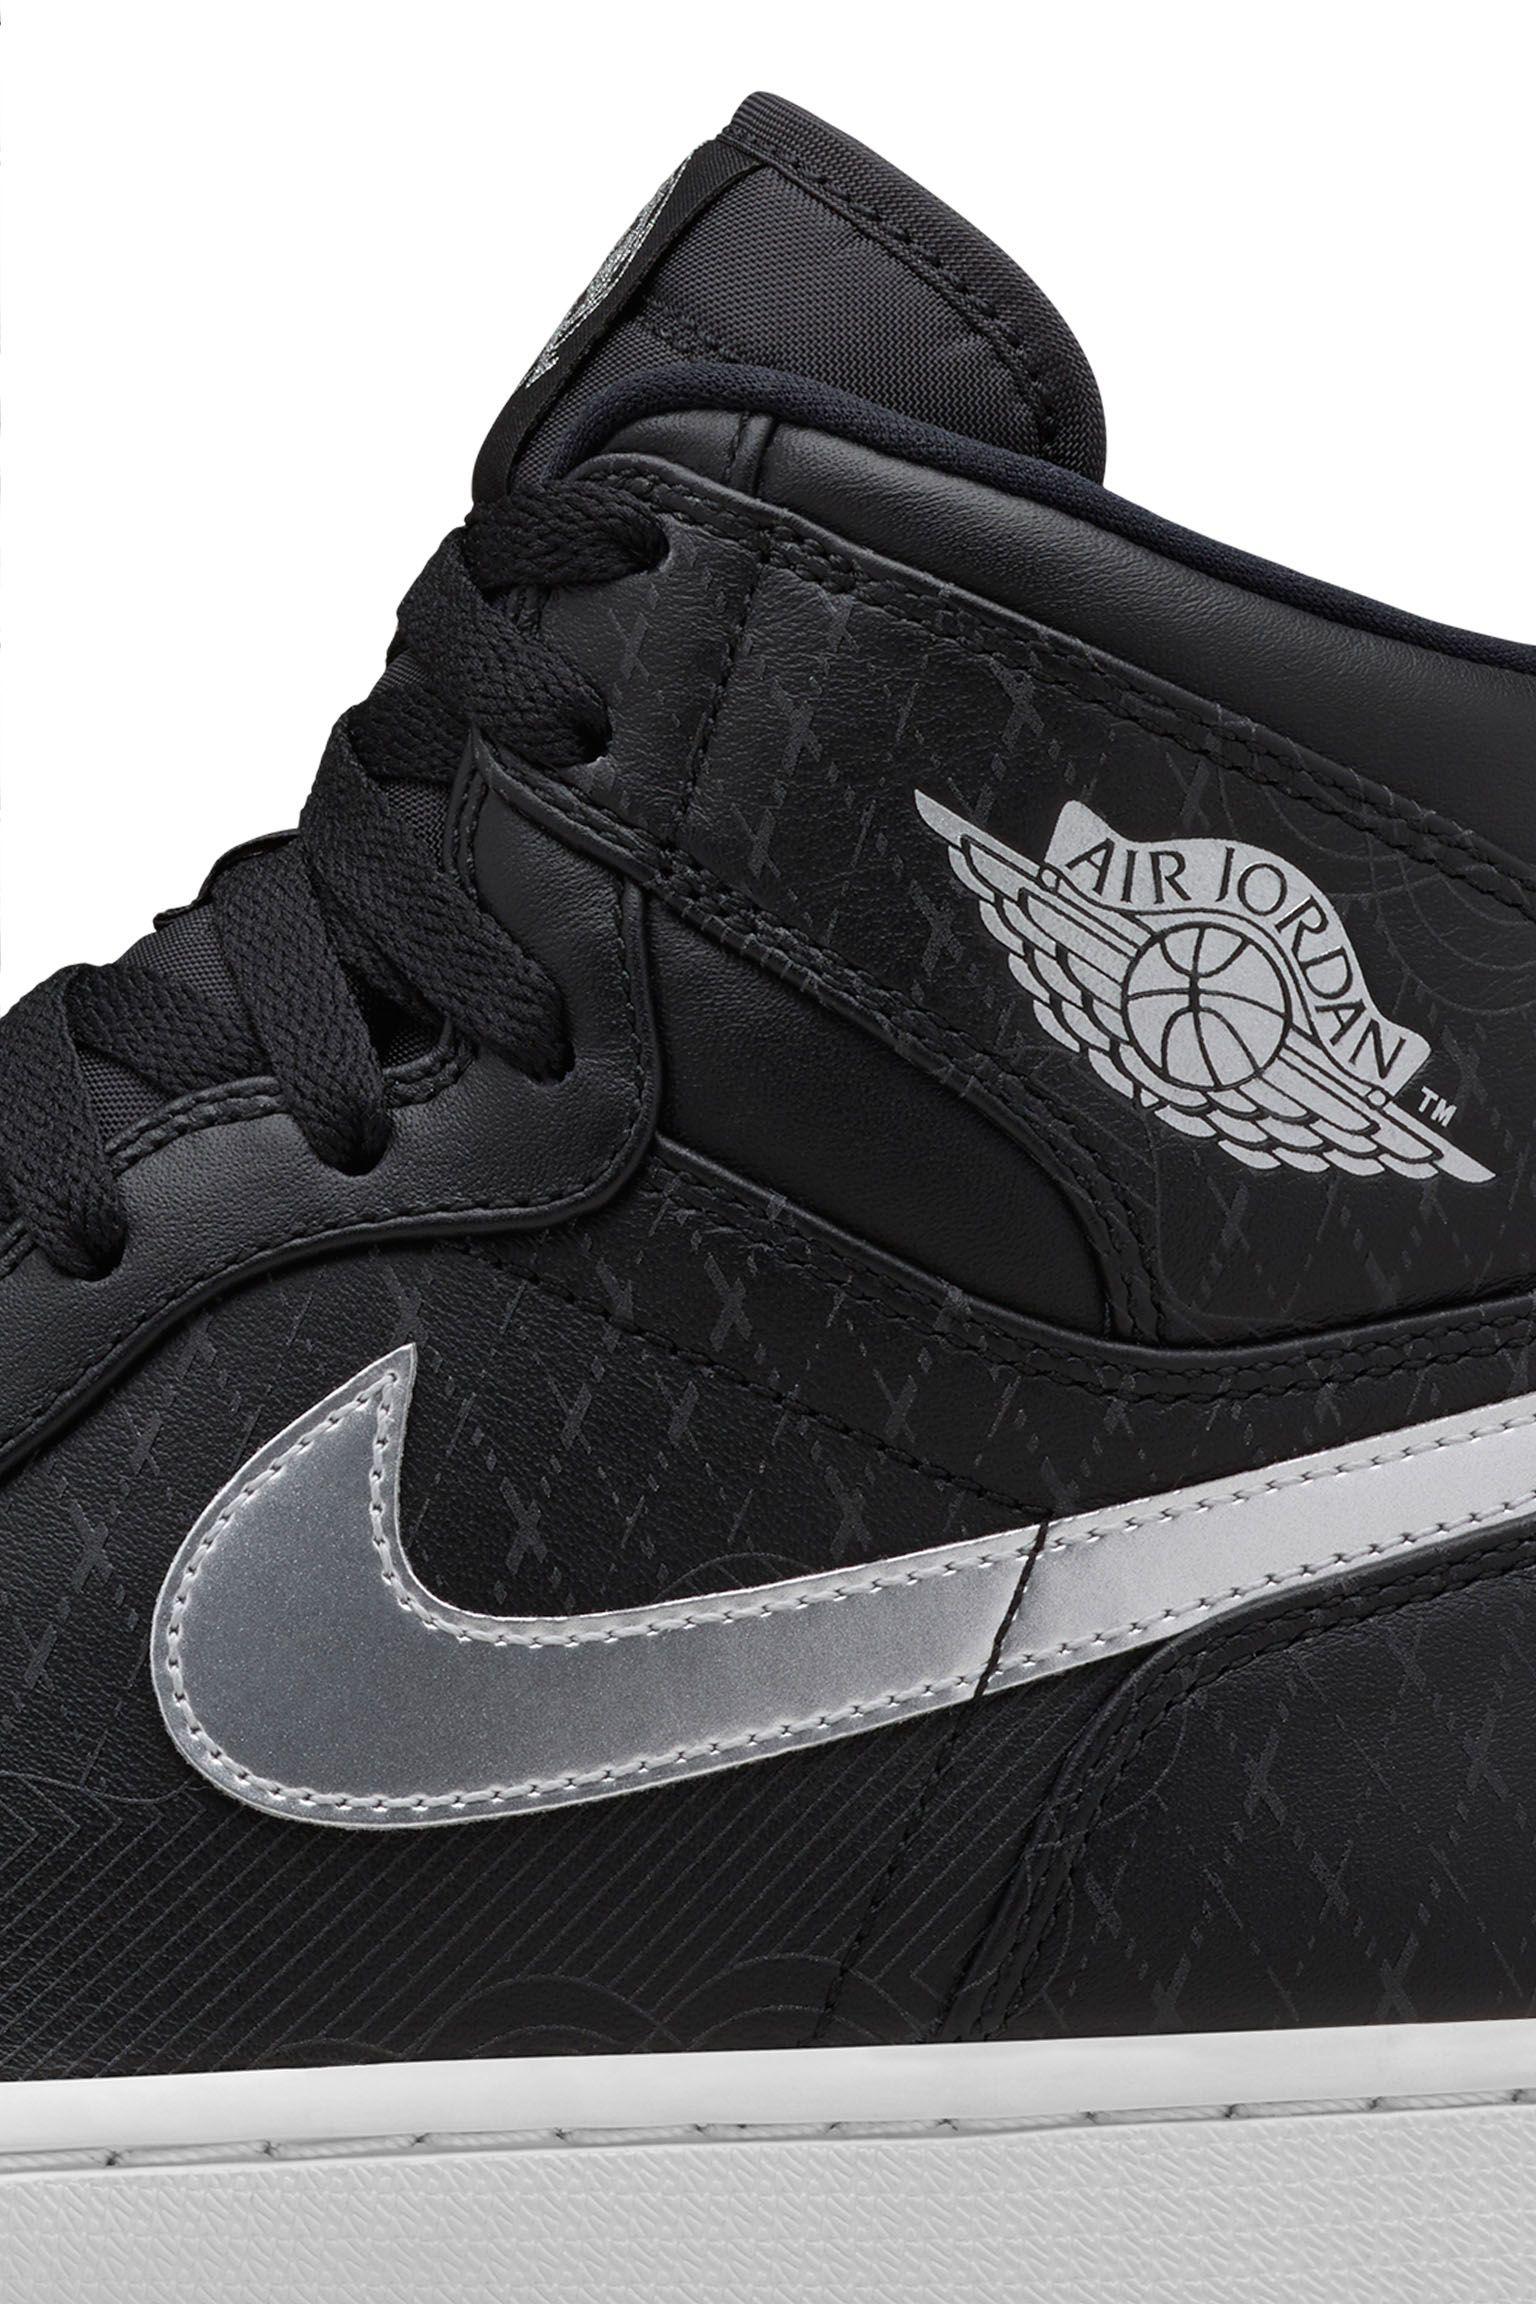 Air Jordan 1 Retro High 'Passport' Release Date